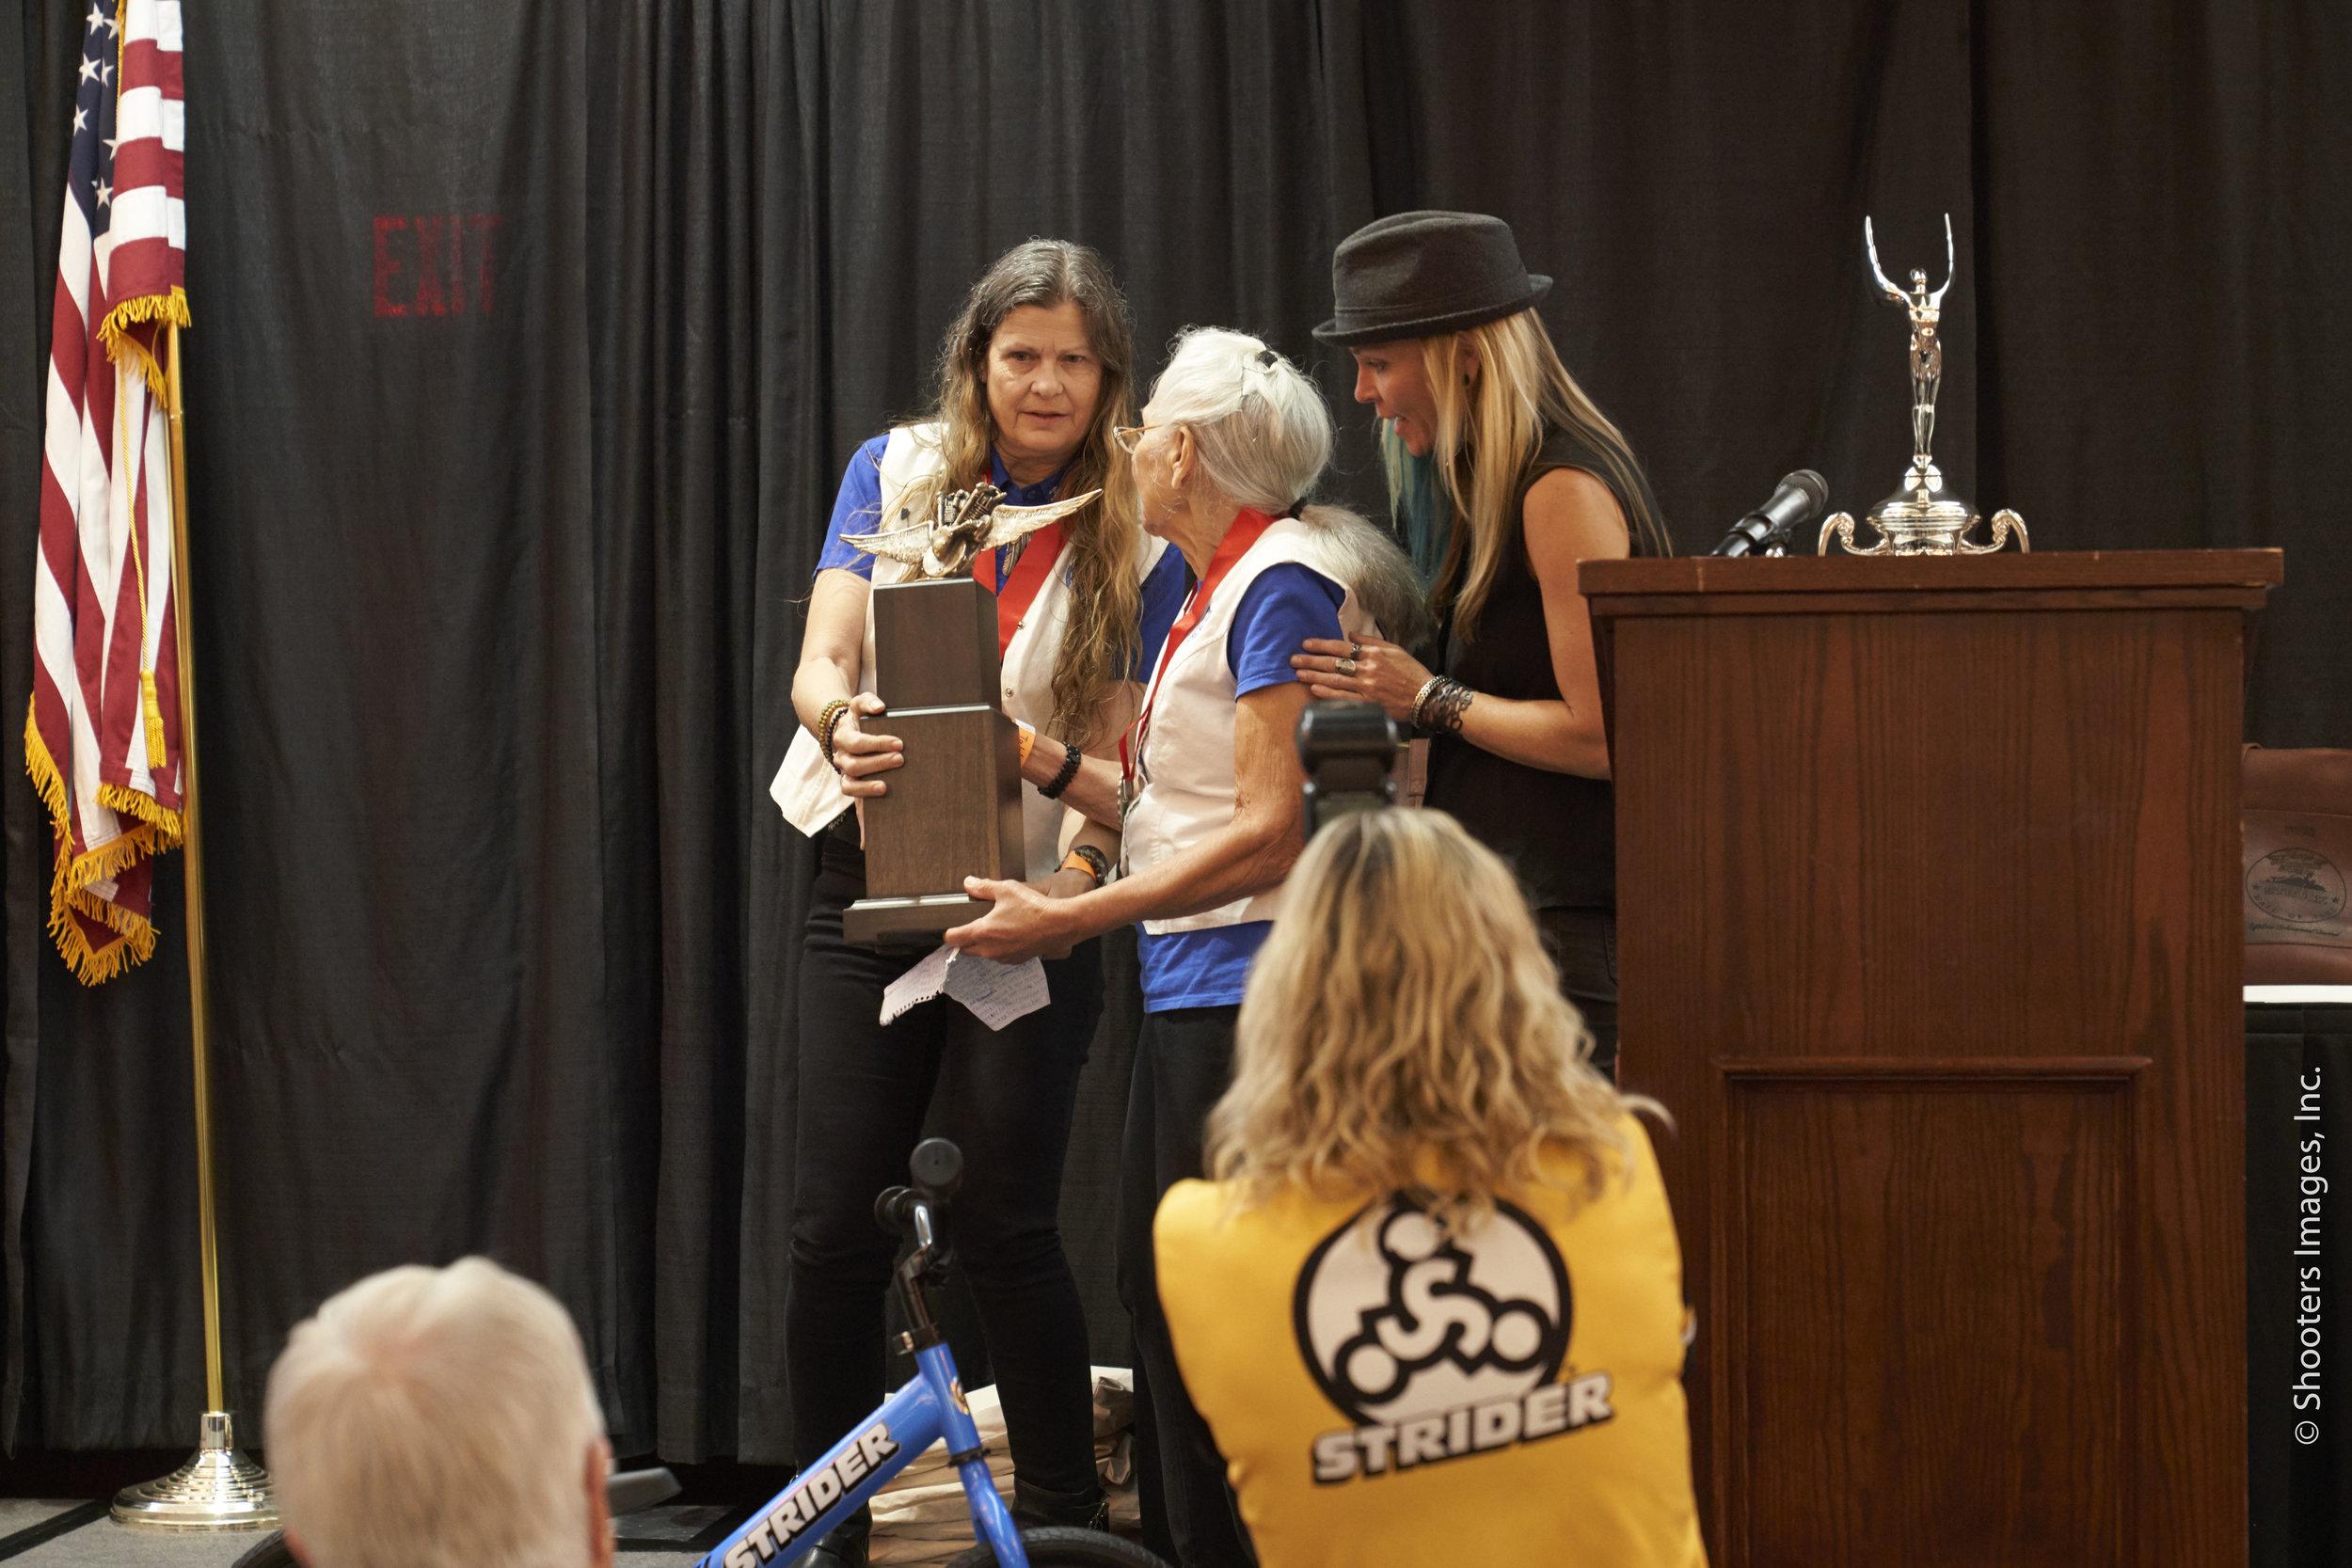 Kris Sommer Simmons, Gloria Struck, & Jessi Combs